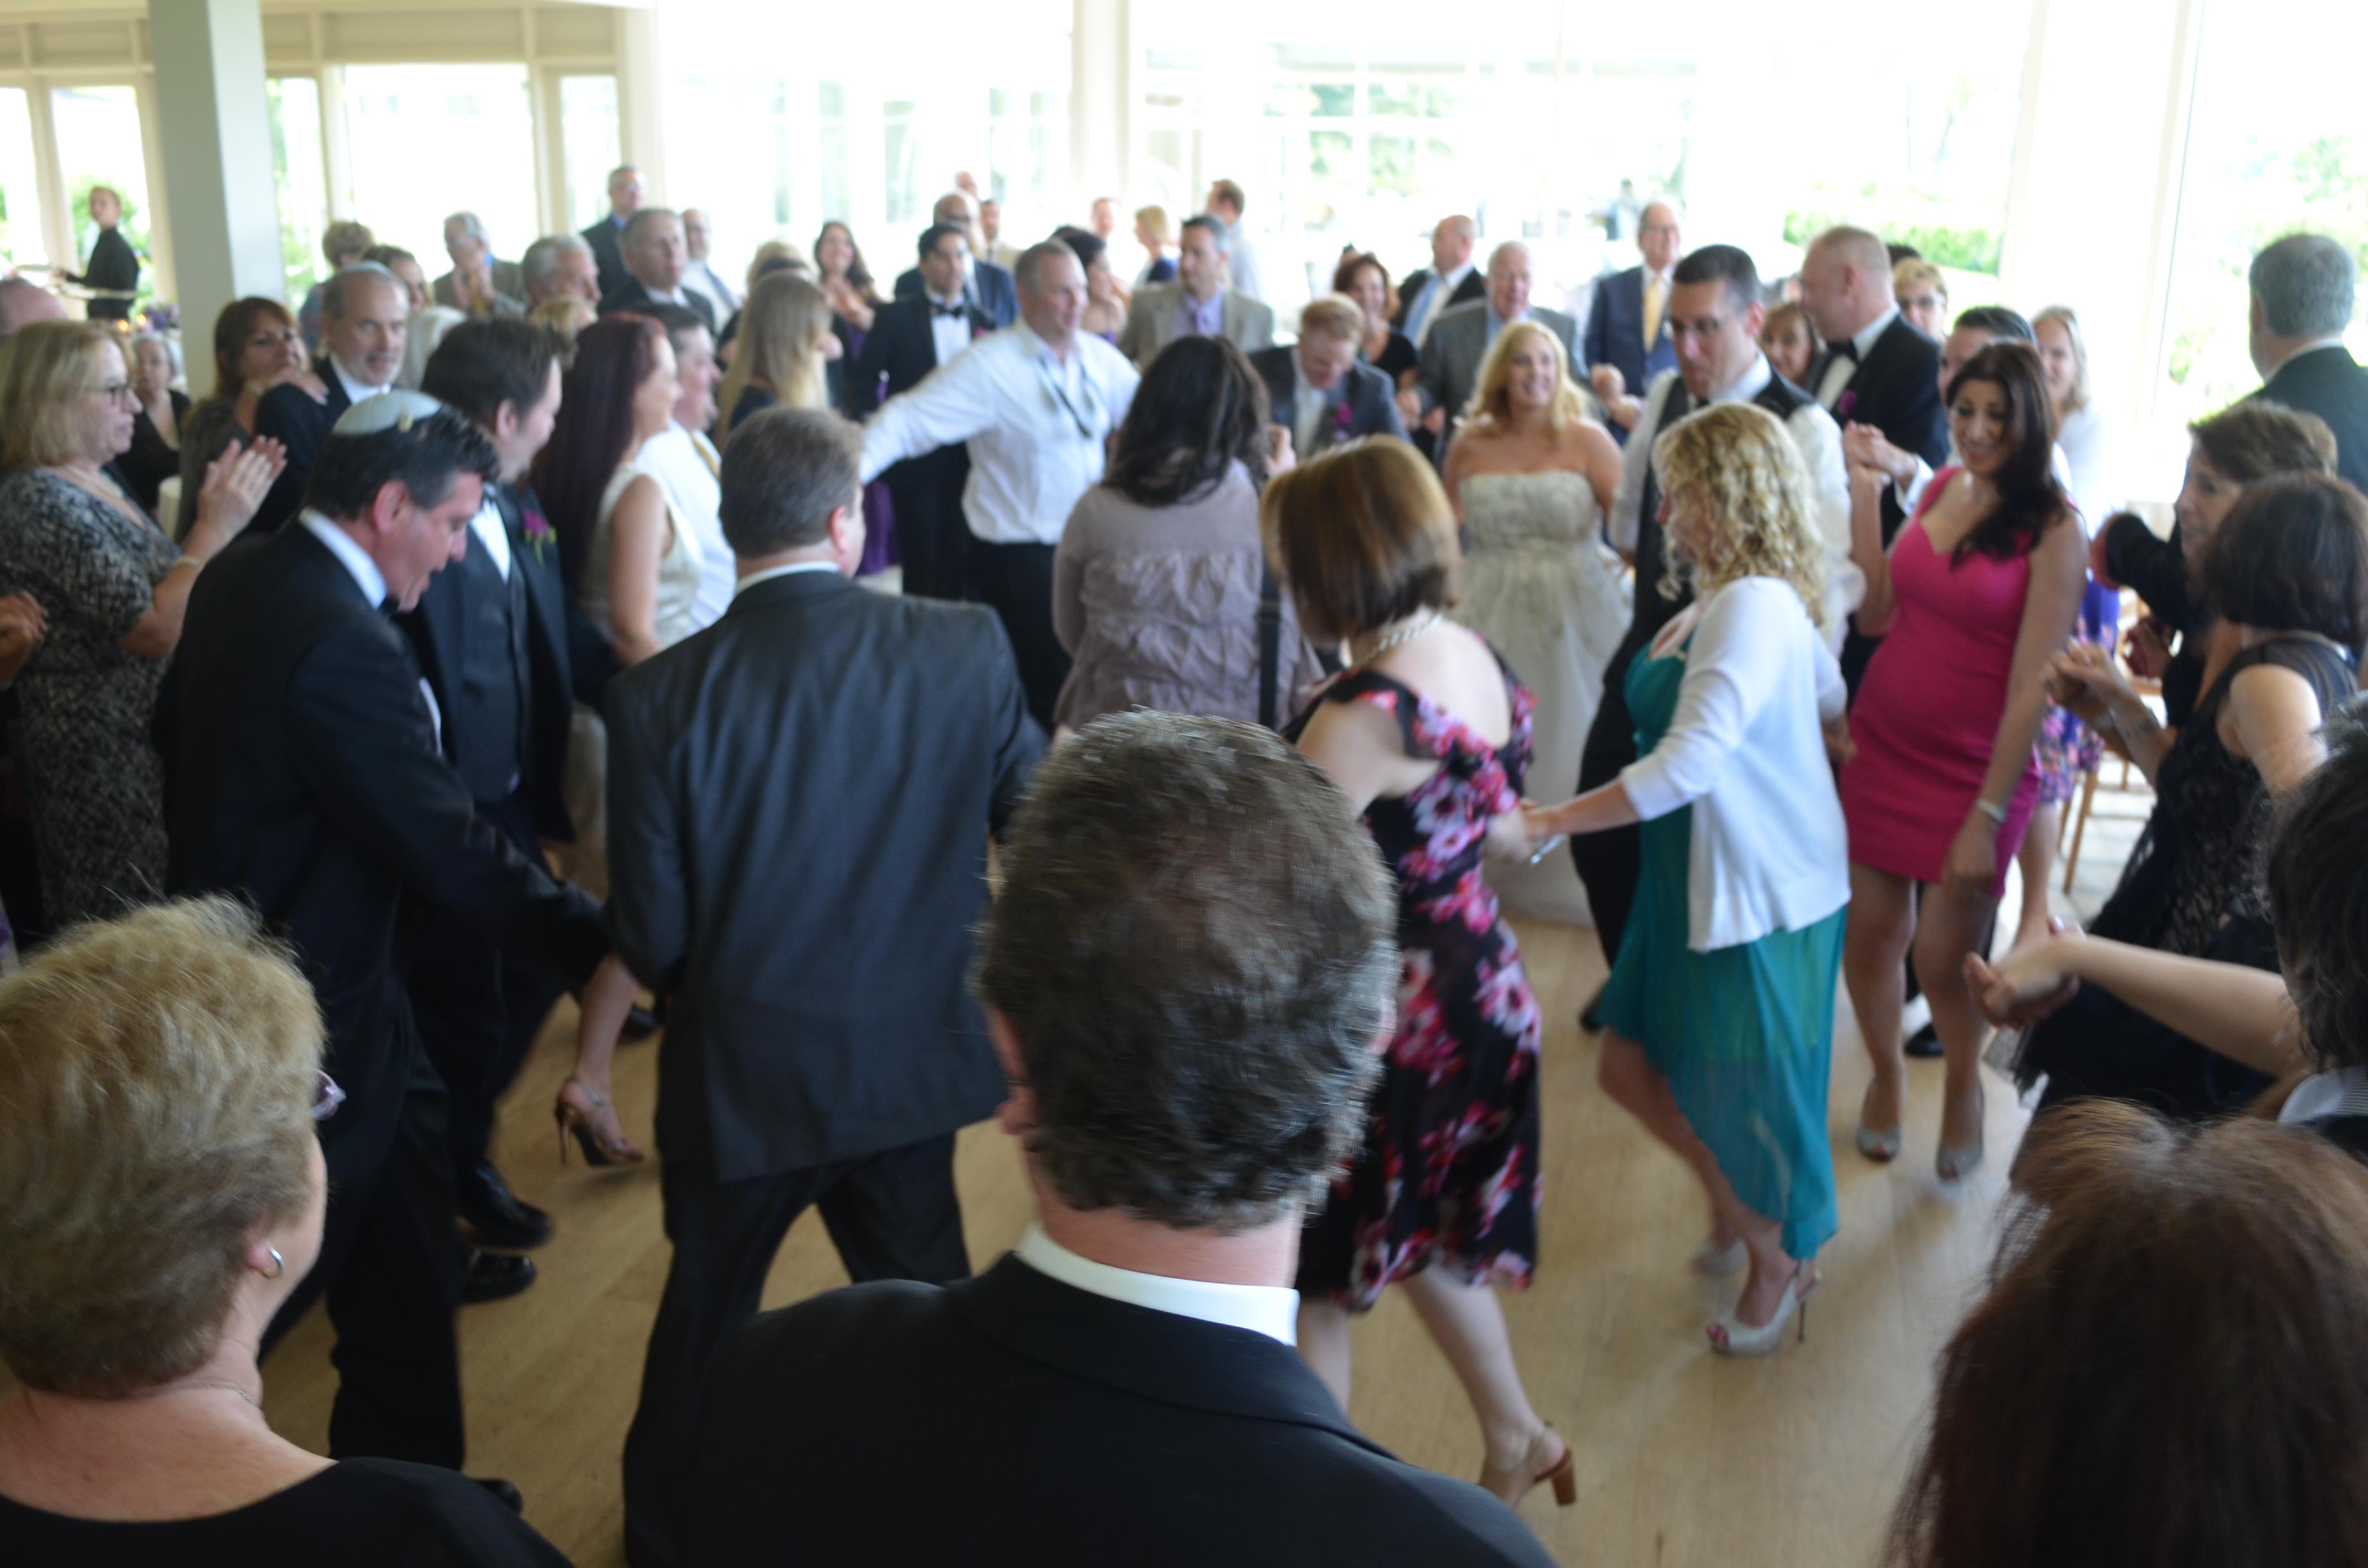 The Garrison Wedding Reception DJ